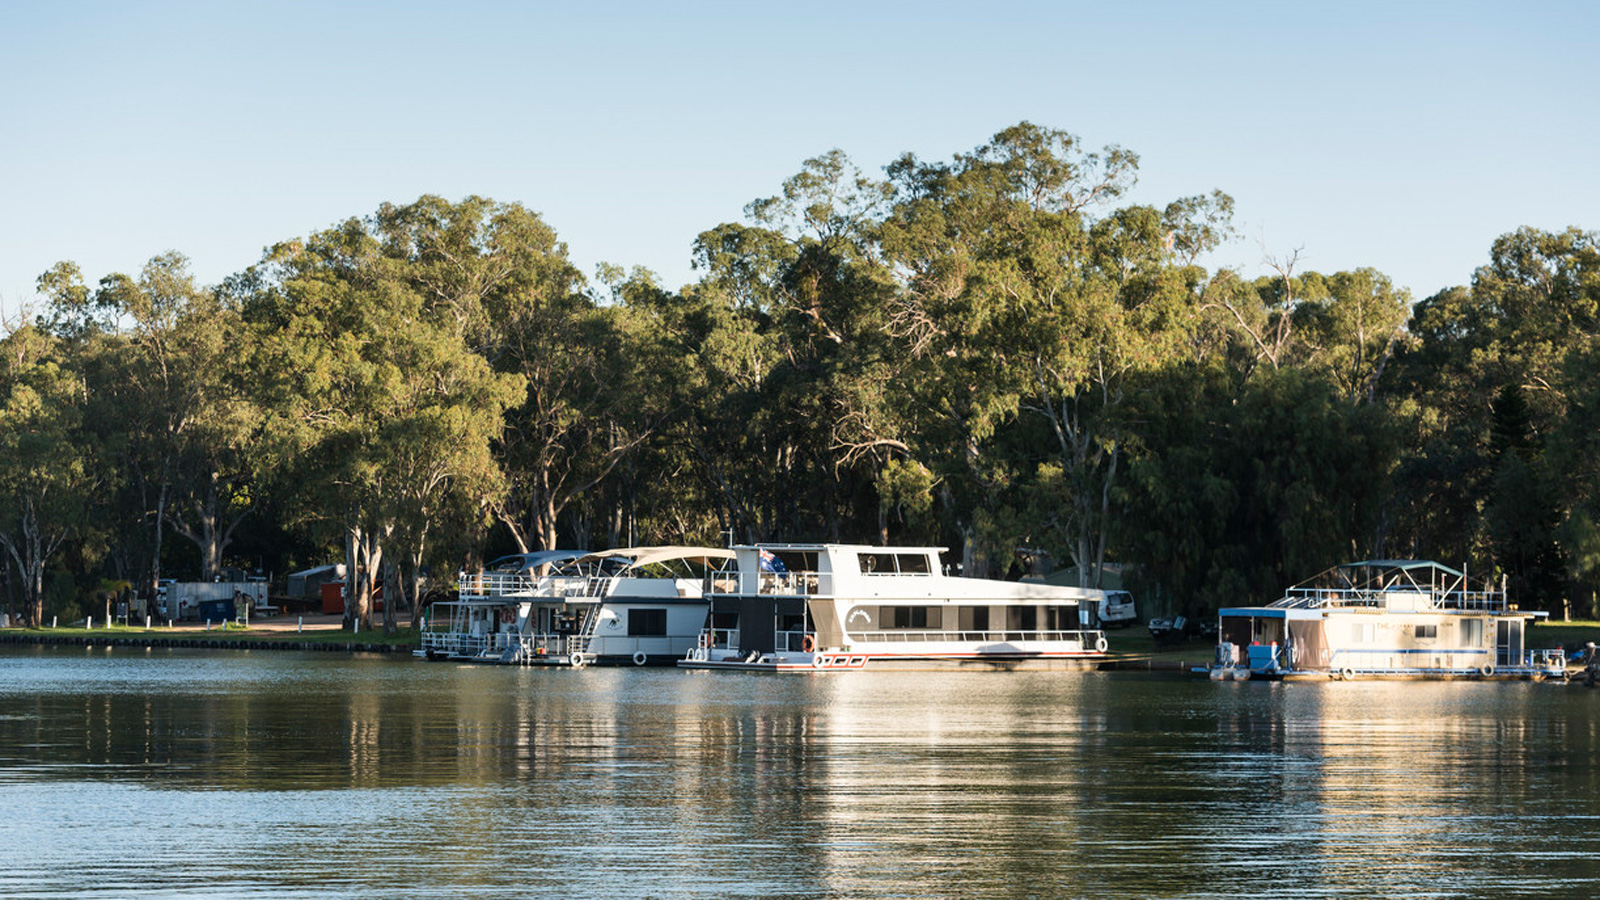 Houseboats, Murray River, Victoria, Australia